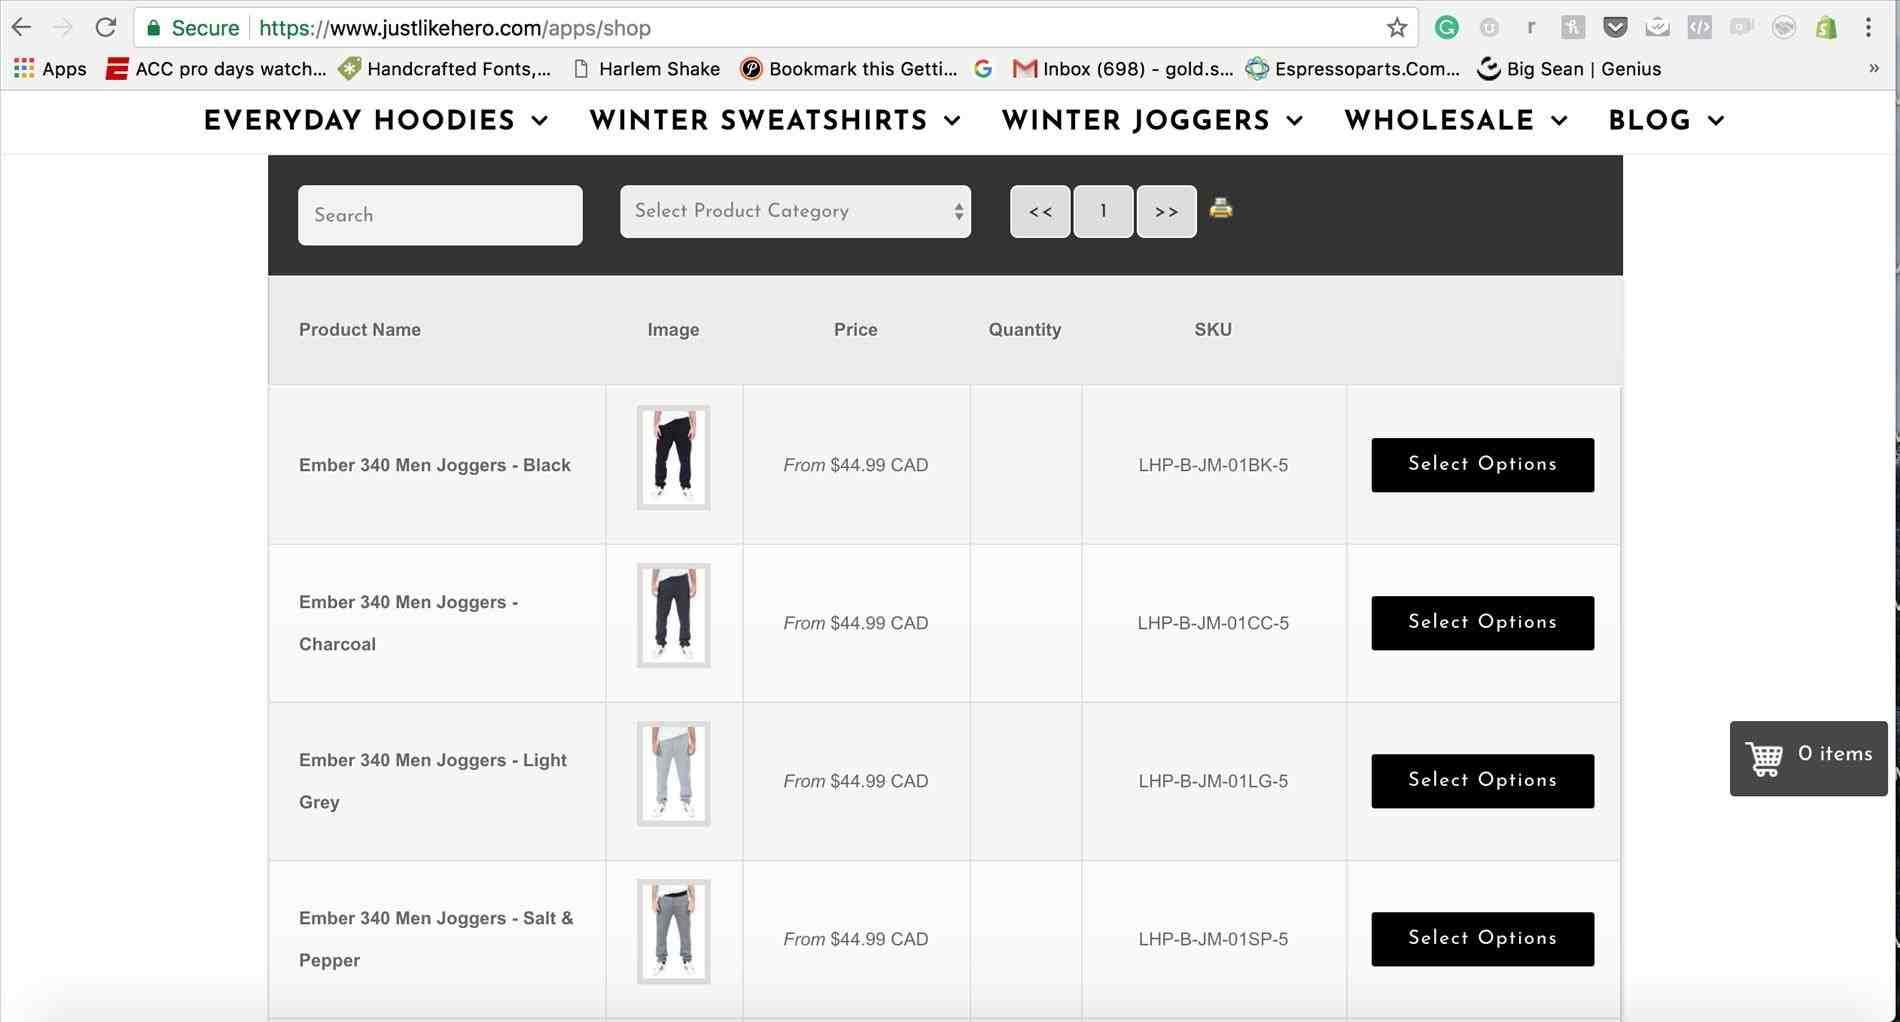 purchase orders overview fleetio help center purchase Bulk Wholesale Purchase Order orders overview fleetio help center adams tc order form